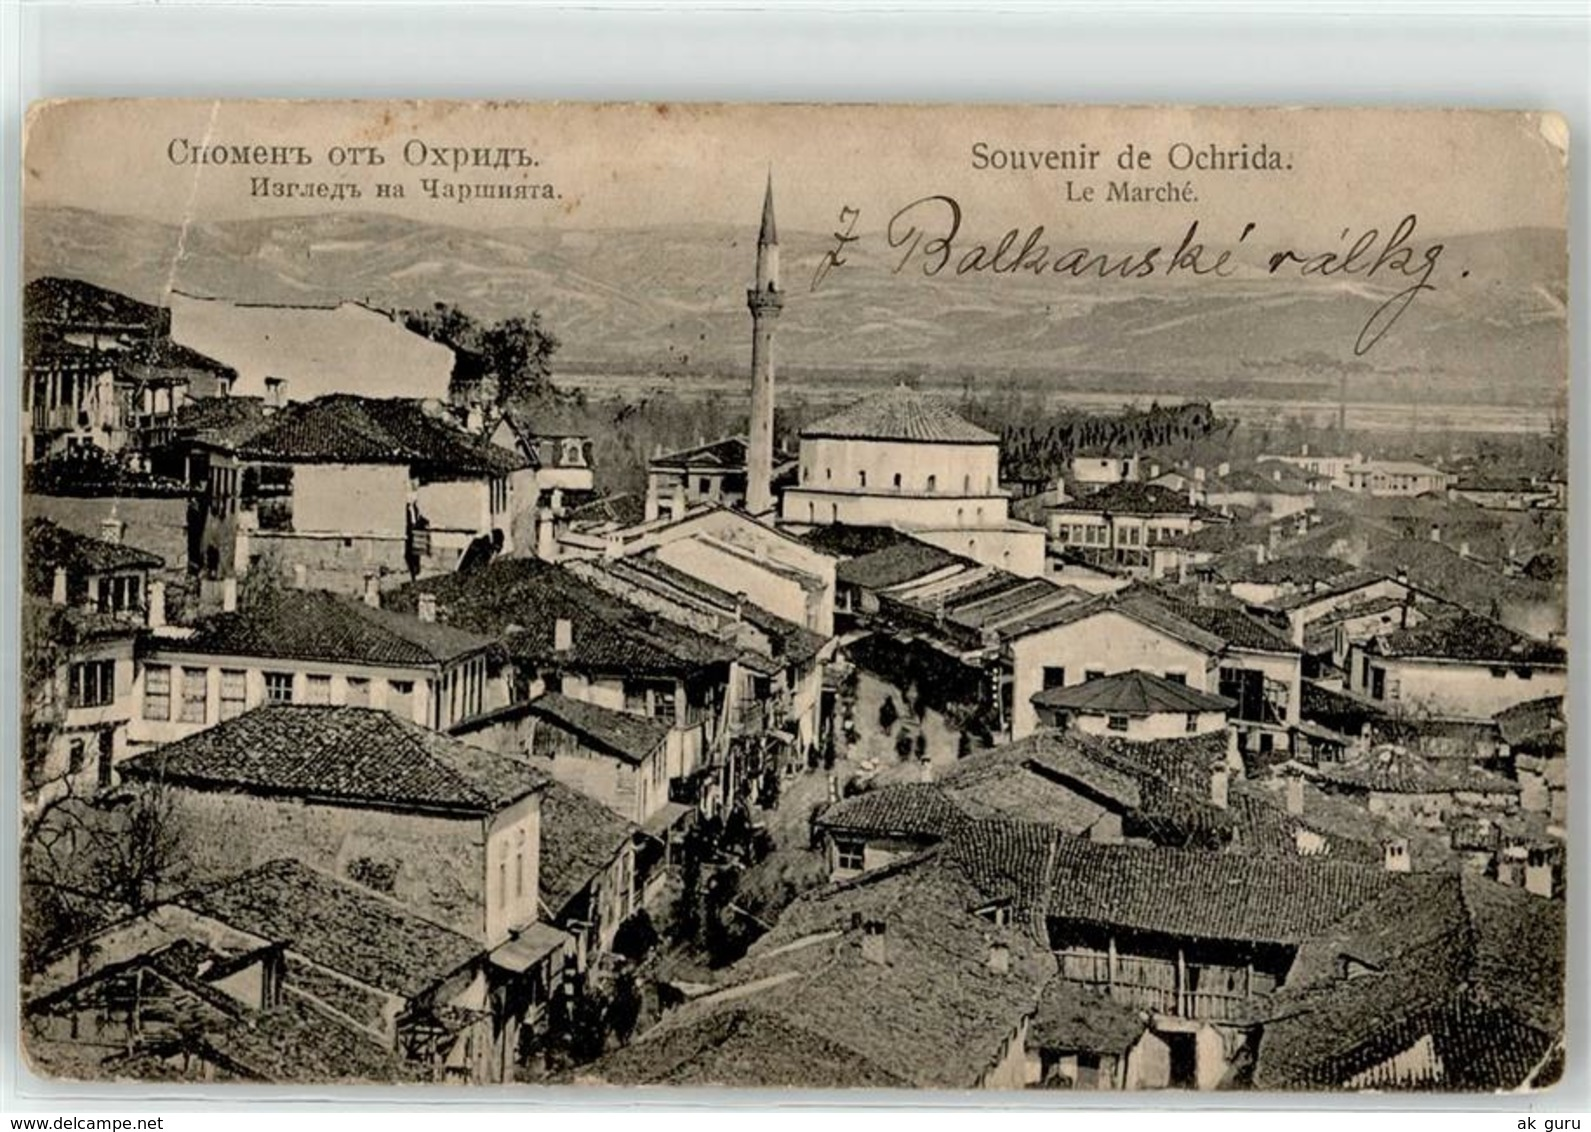 52884392 - Ohrid - Macedonia